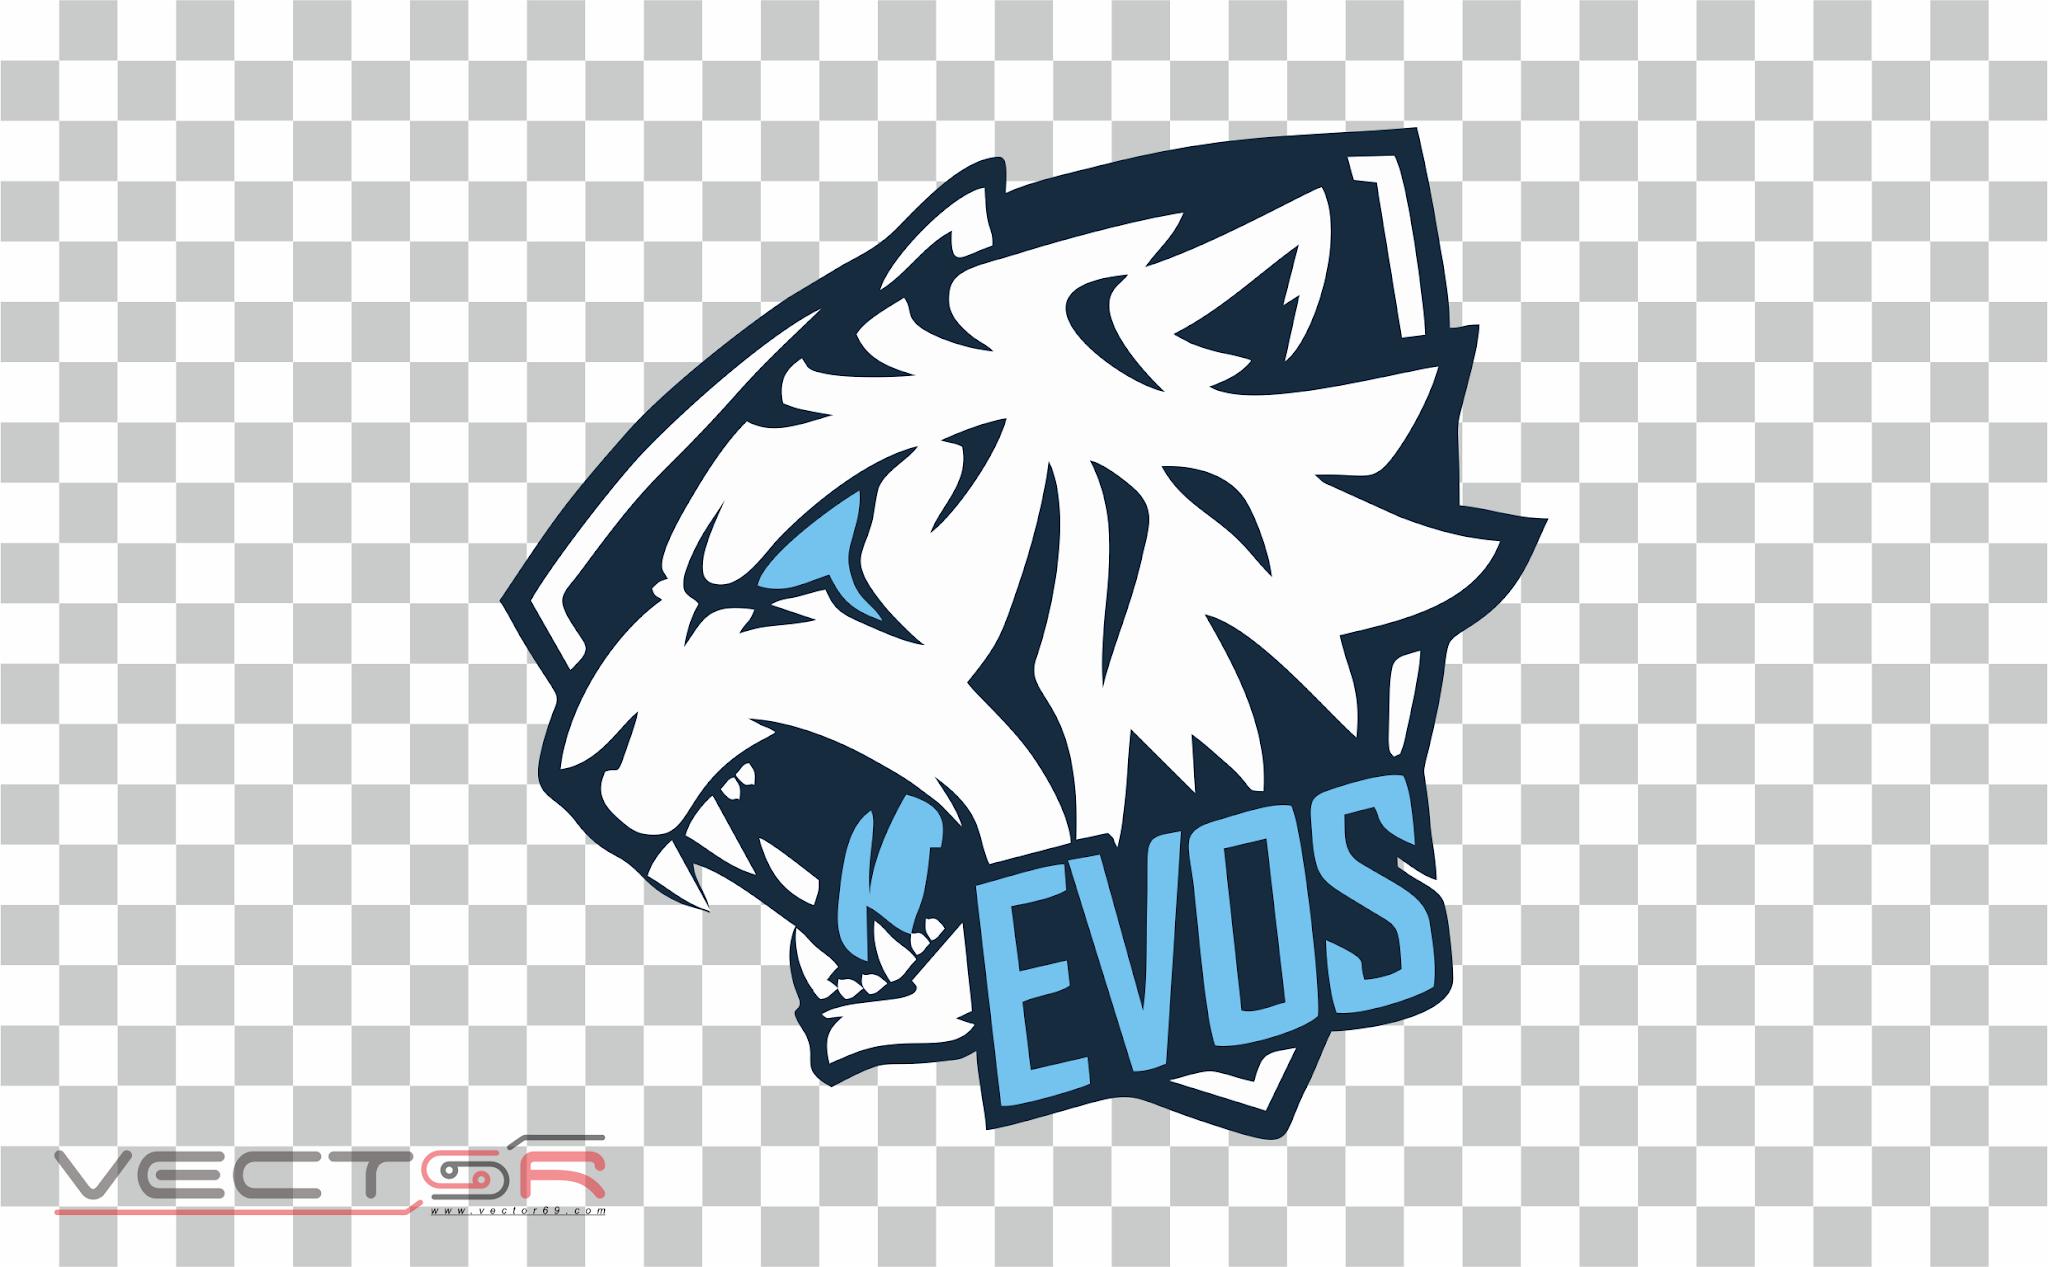 EVOS Esports Logo - Download Vector File PNG (Portable Network Graphics)